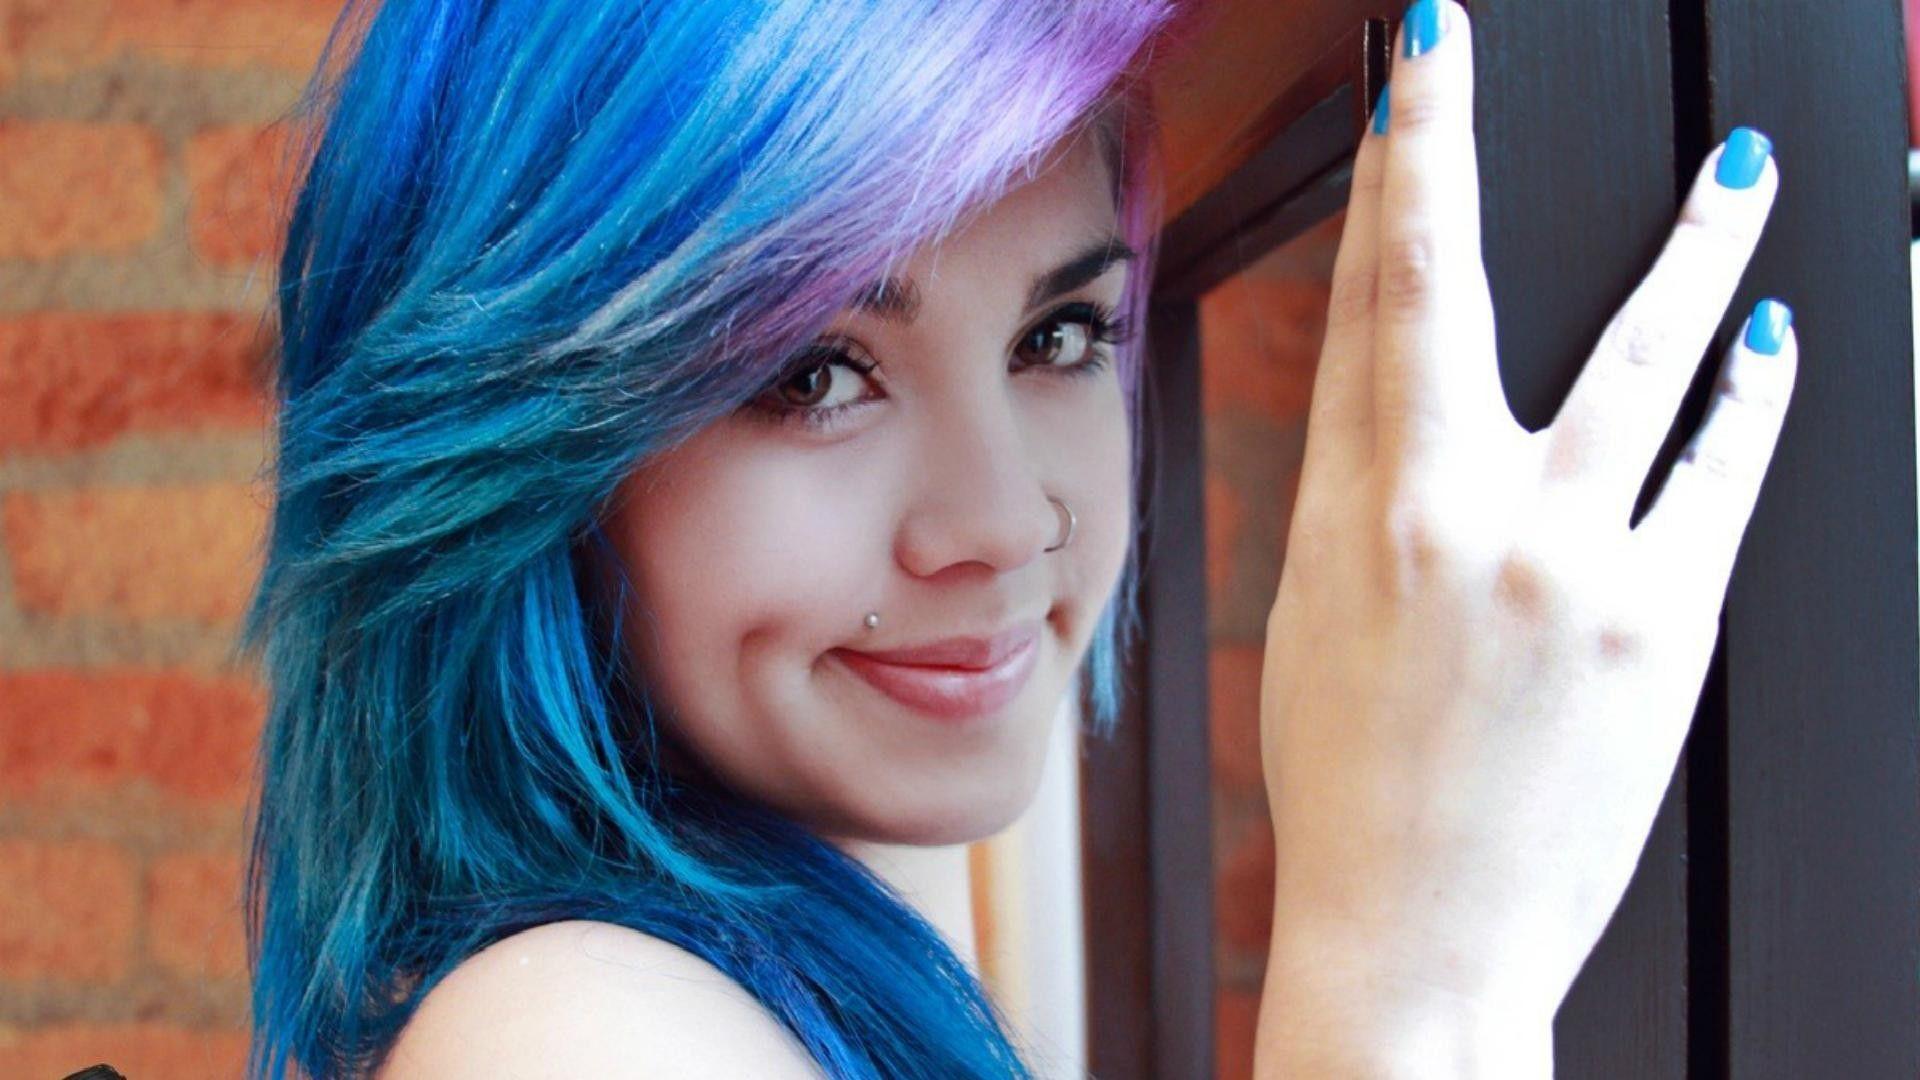 Cute Emo Girl Wallpapers - Top Free Cute Emo Girl